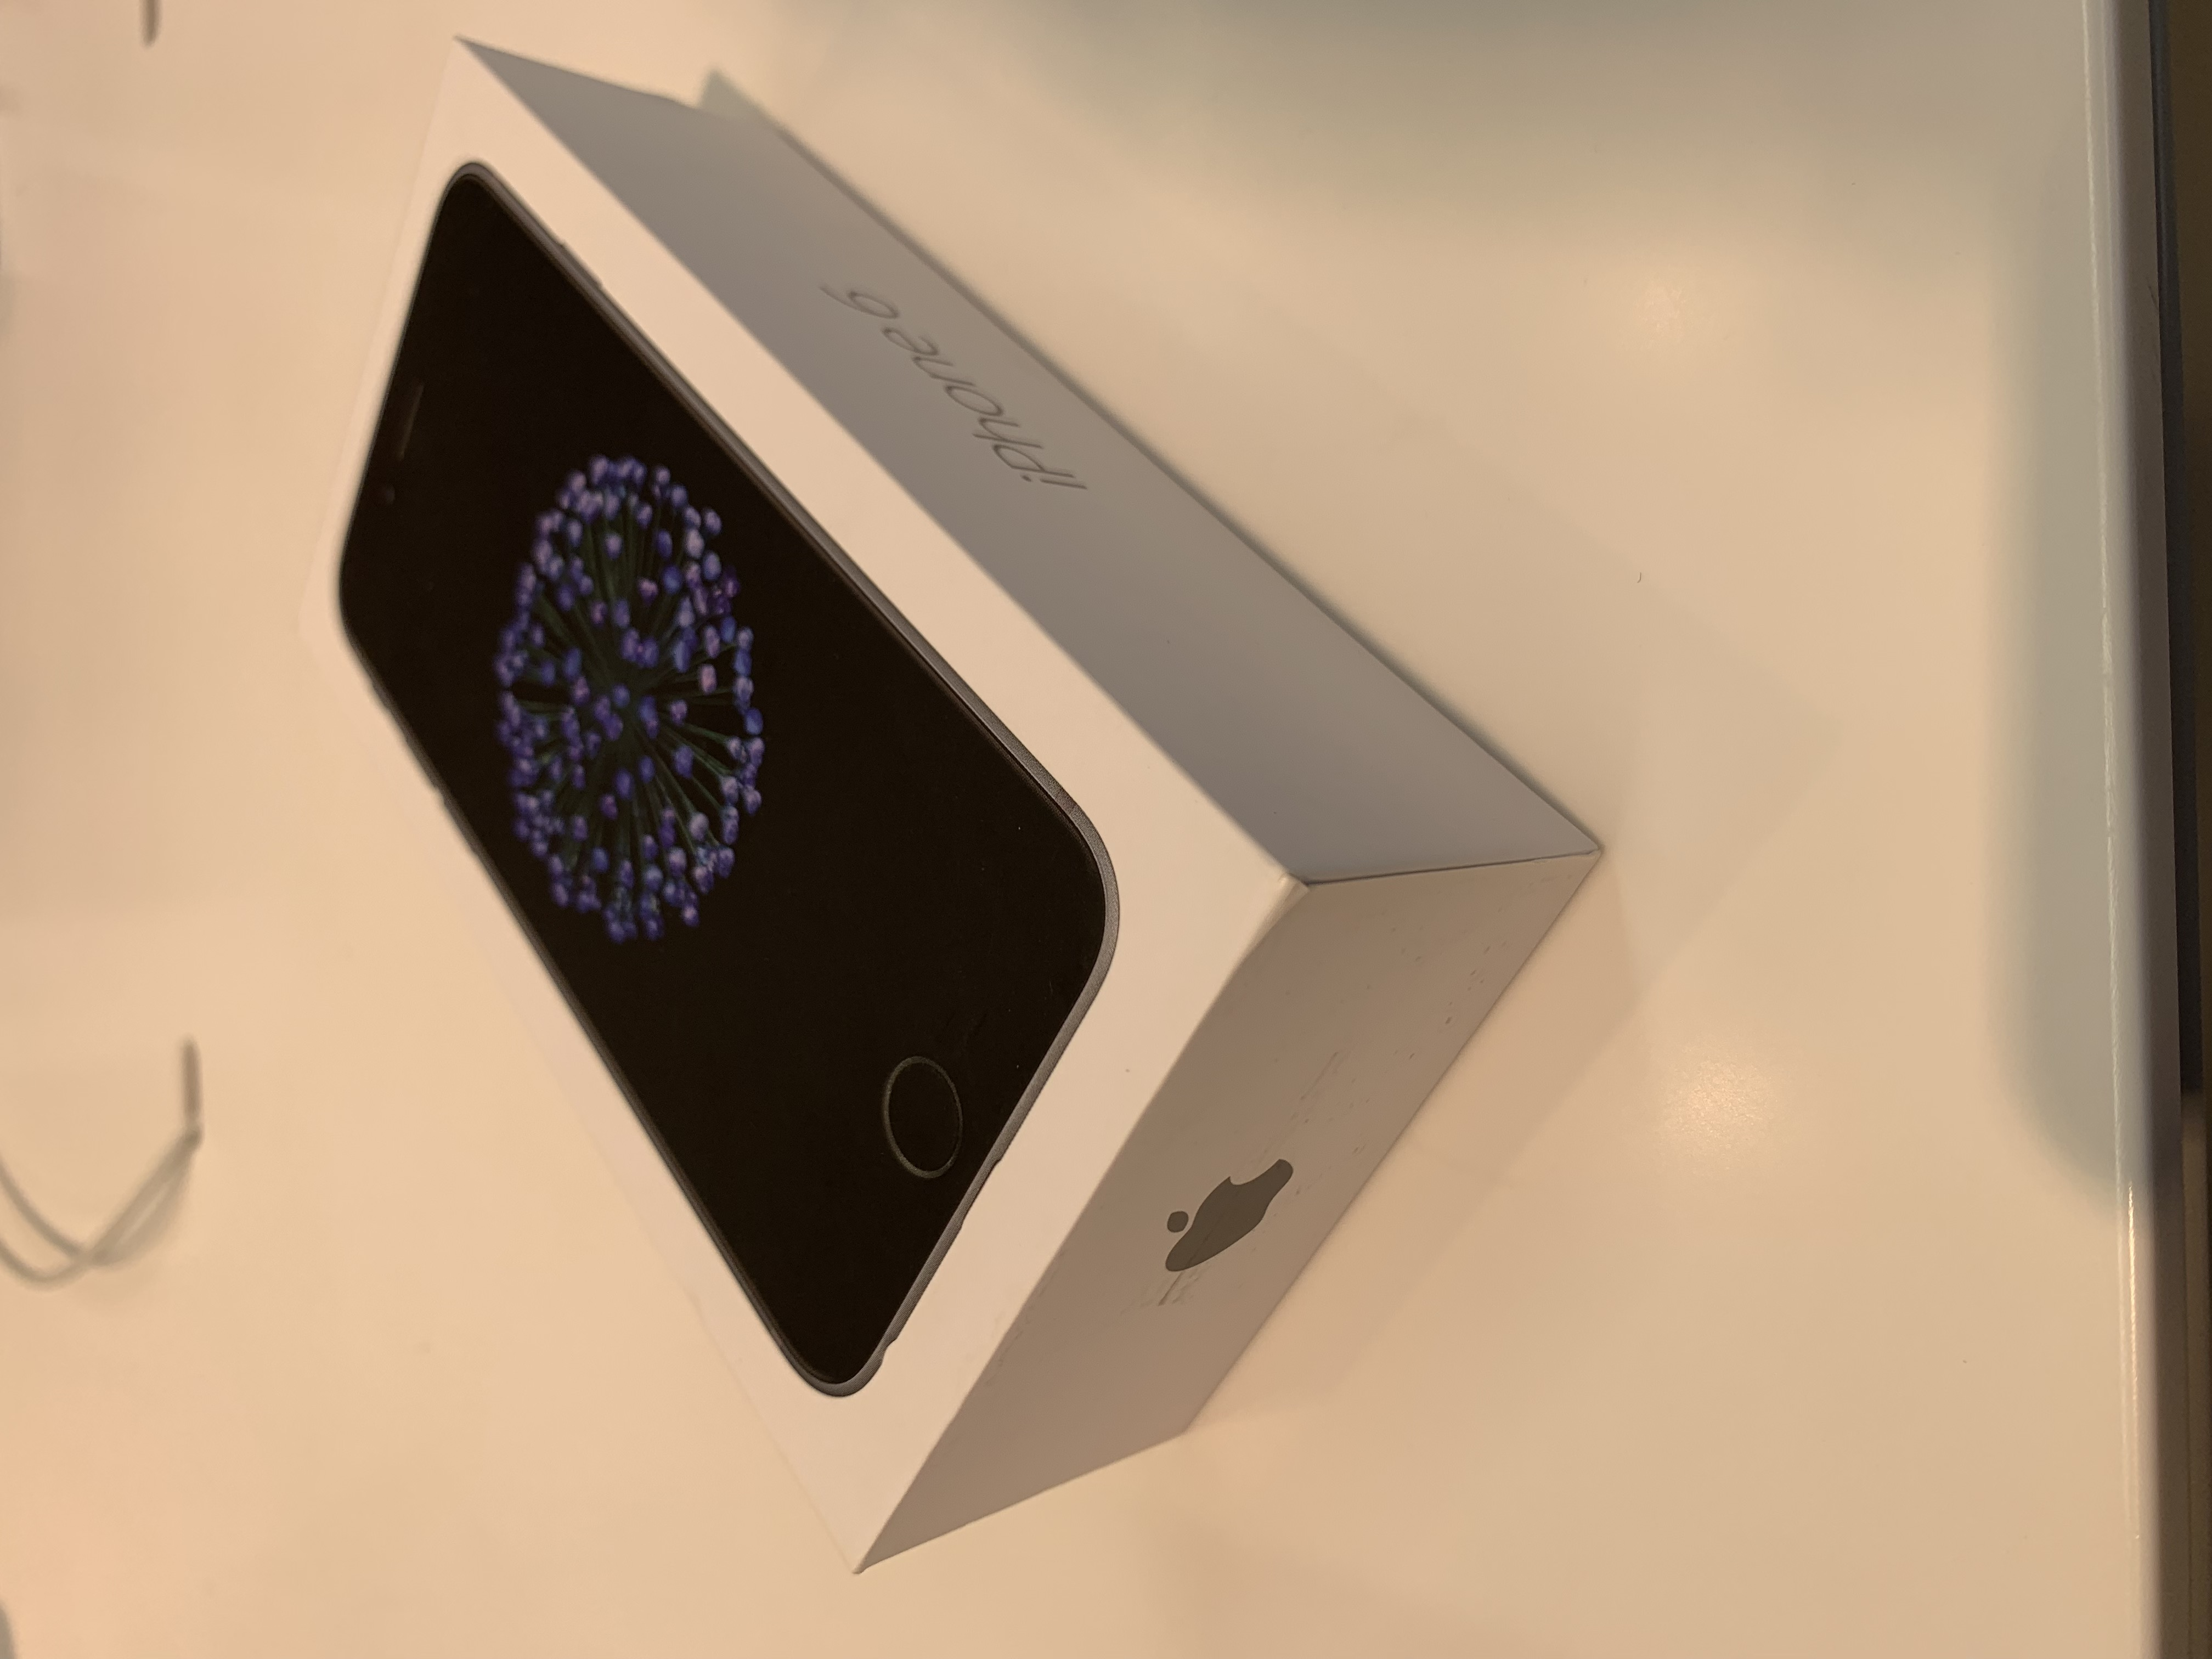 iPhone 6 32GB, 32 GB, Space Gray, obraz 7